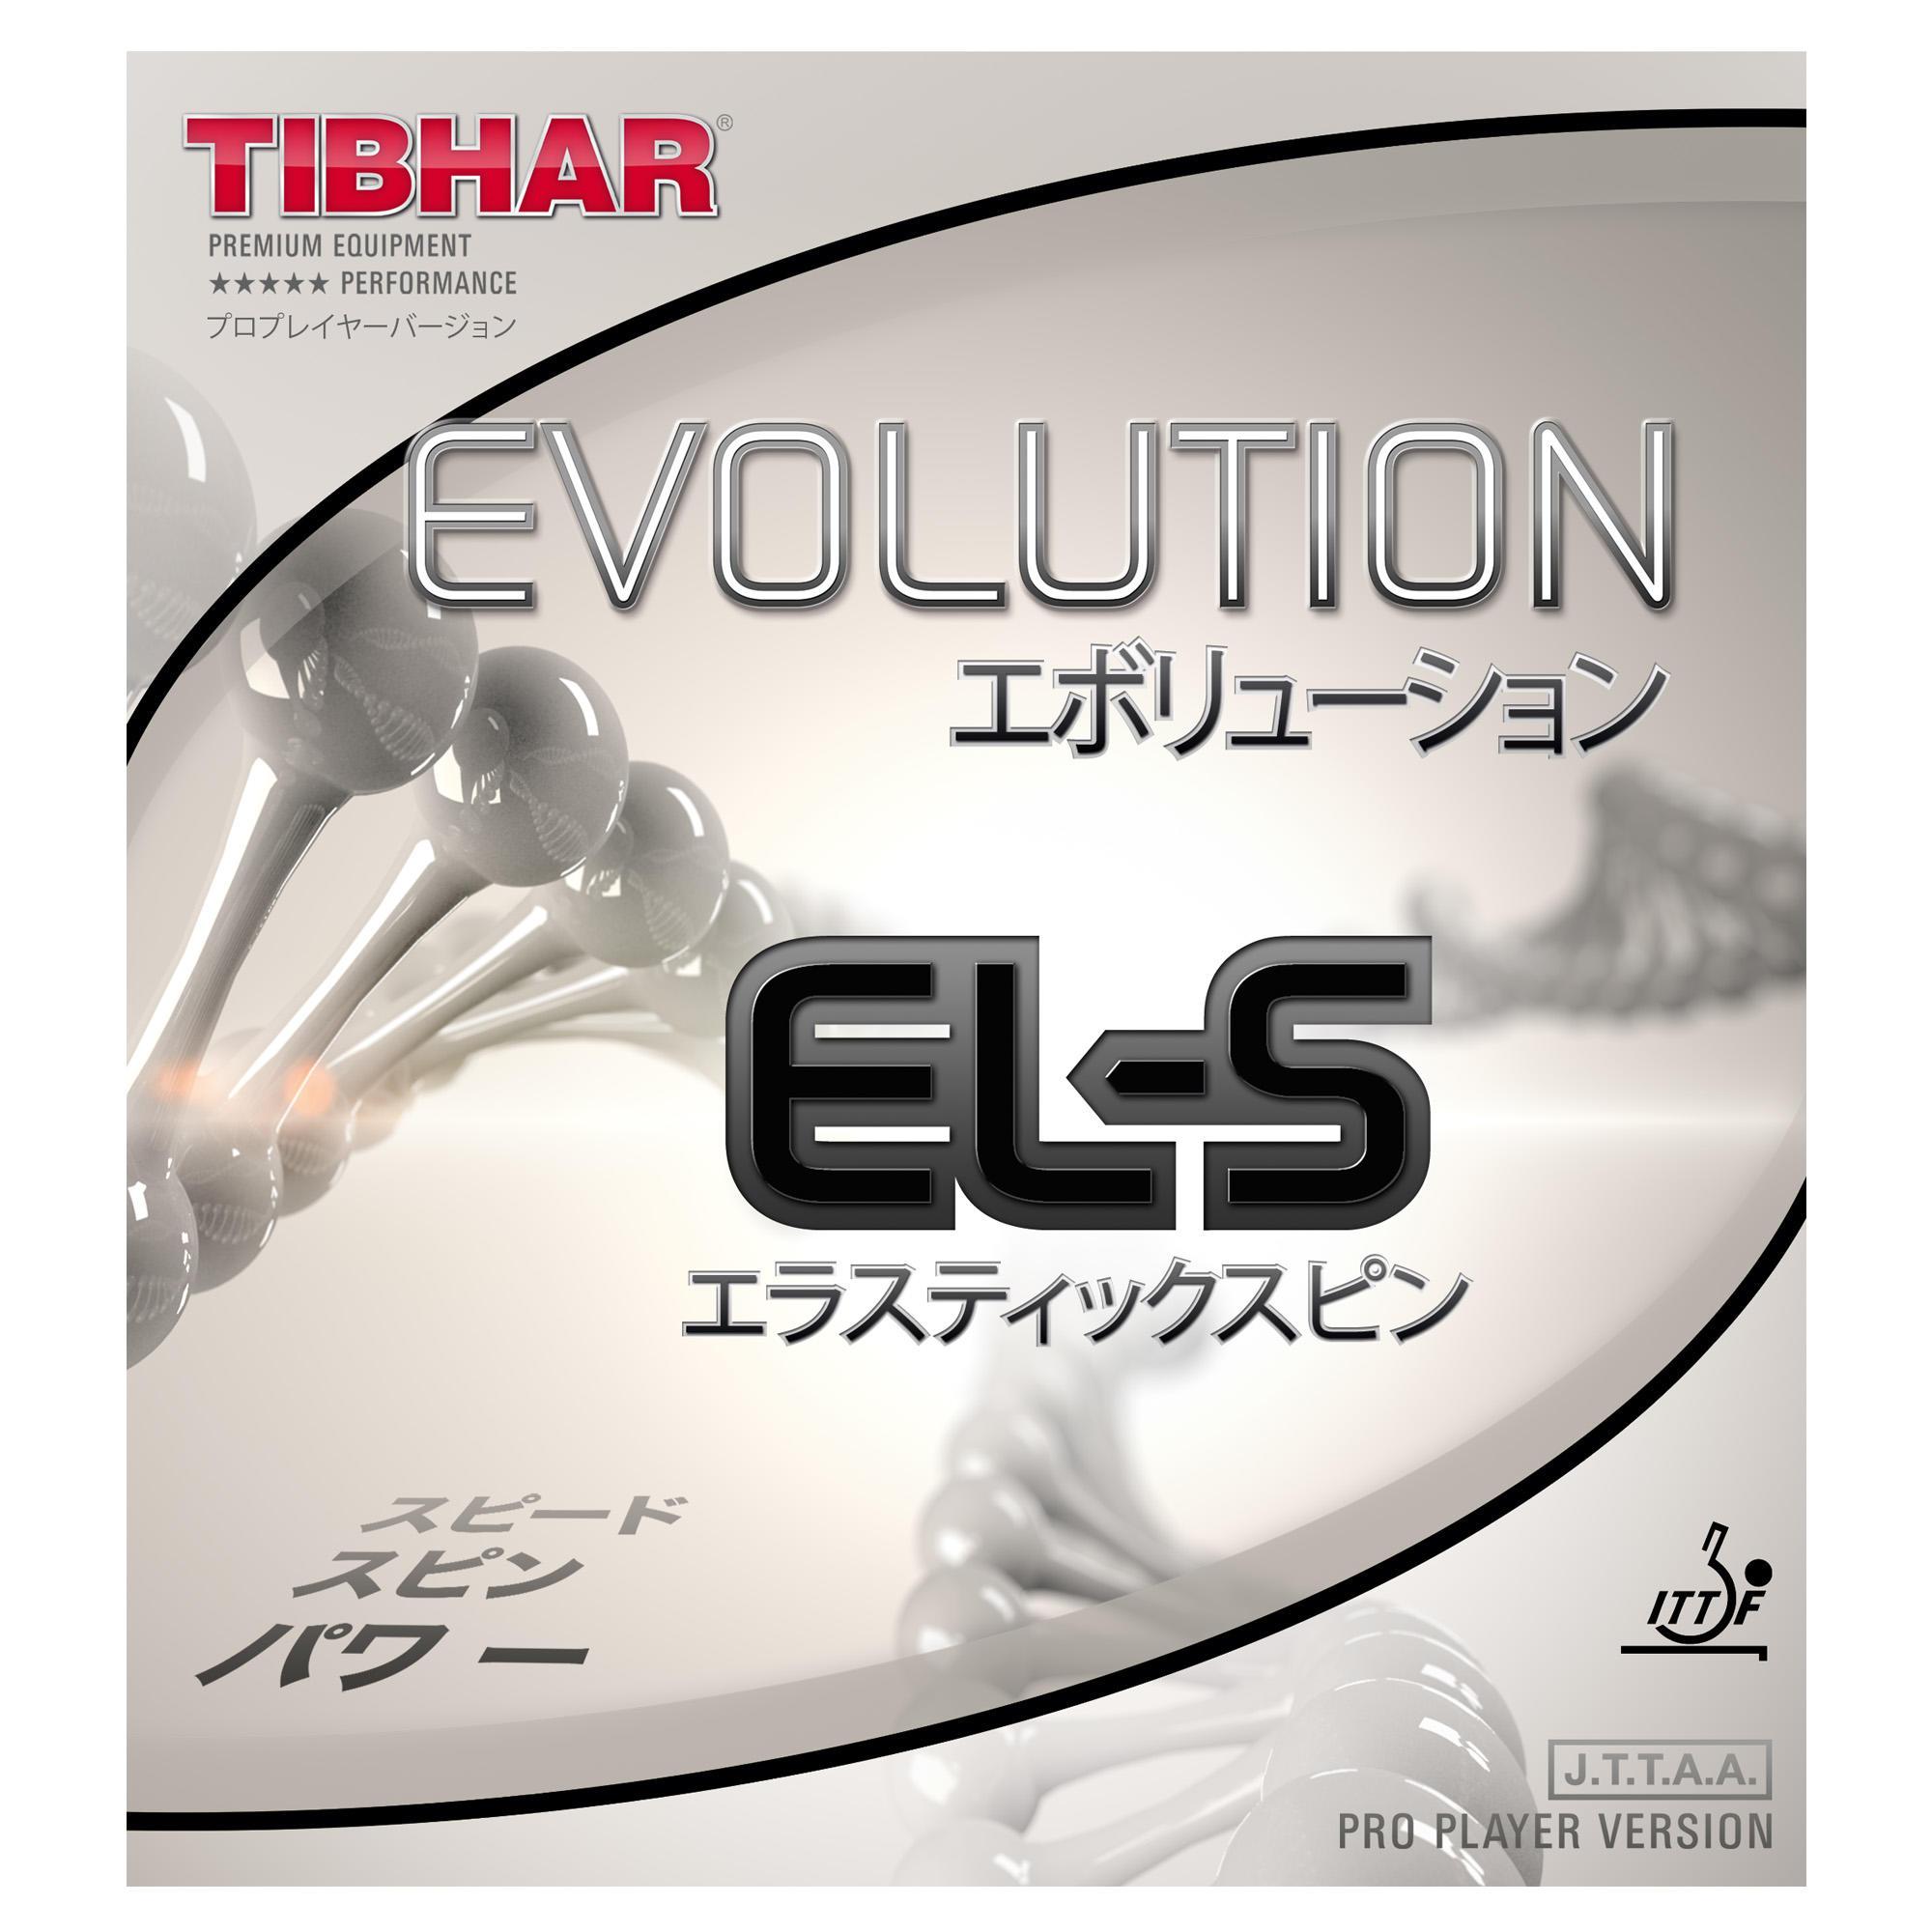 Față Tibhar Evolution EL-S imagine